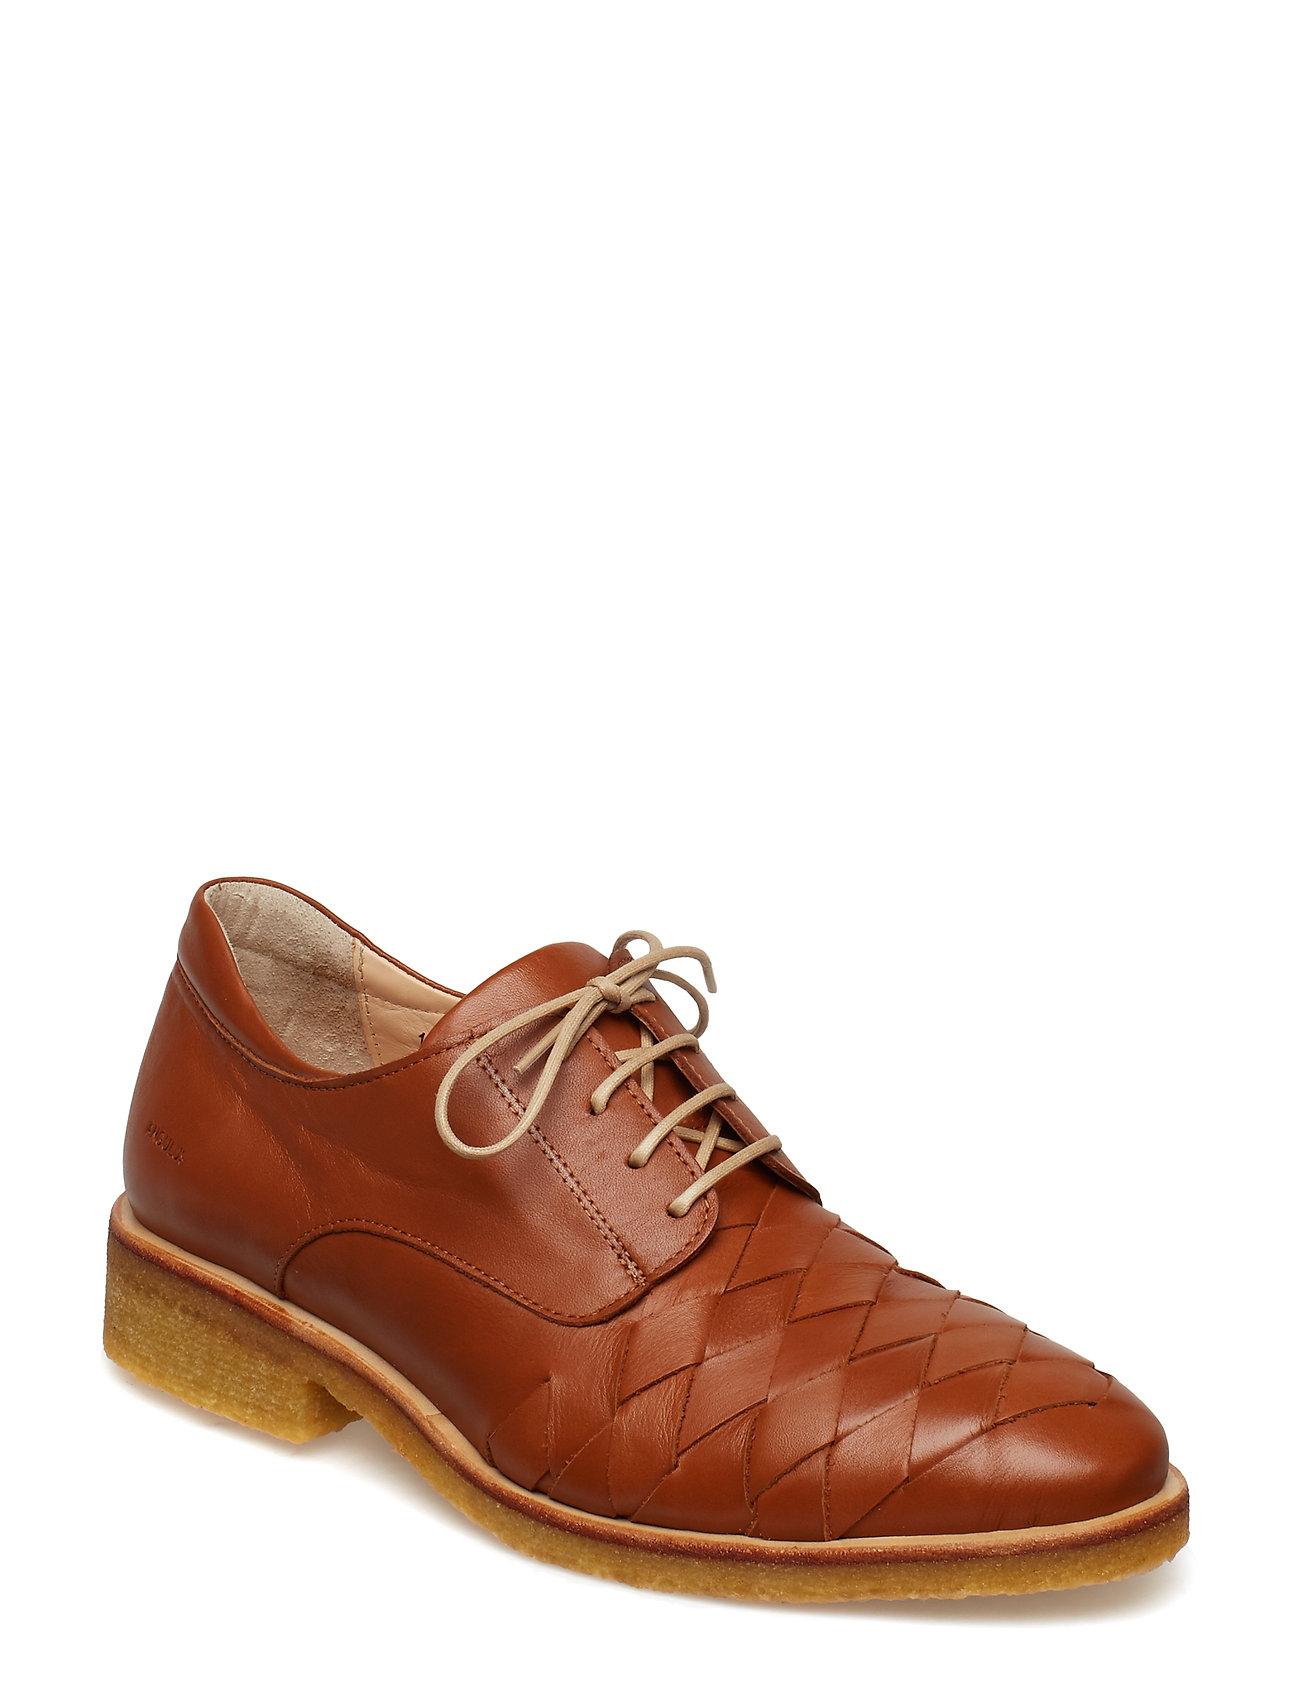 ANGULUS - Shoes - flat - 1838 cognac - 0